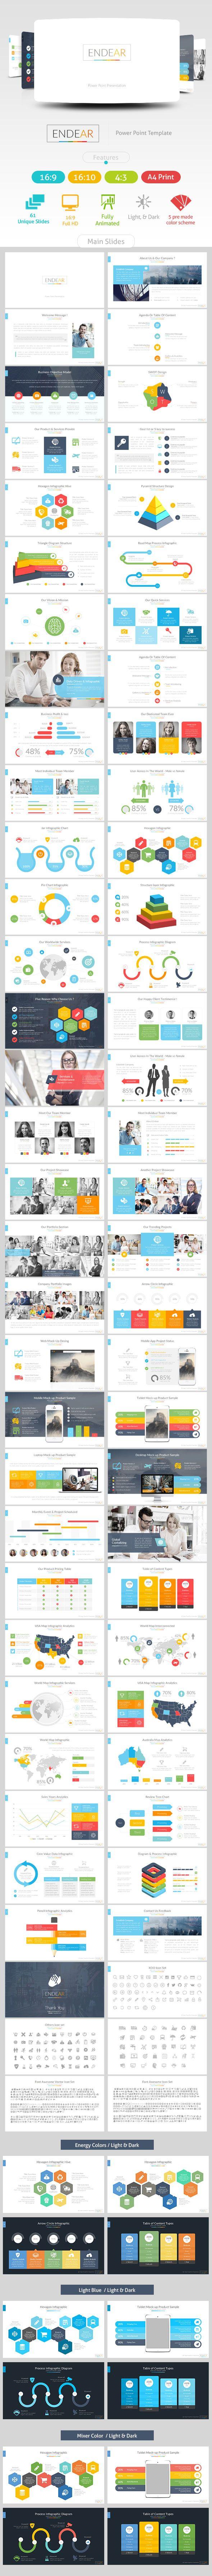 Endear Power Point Presentation - Business PowerPoint Templates